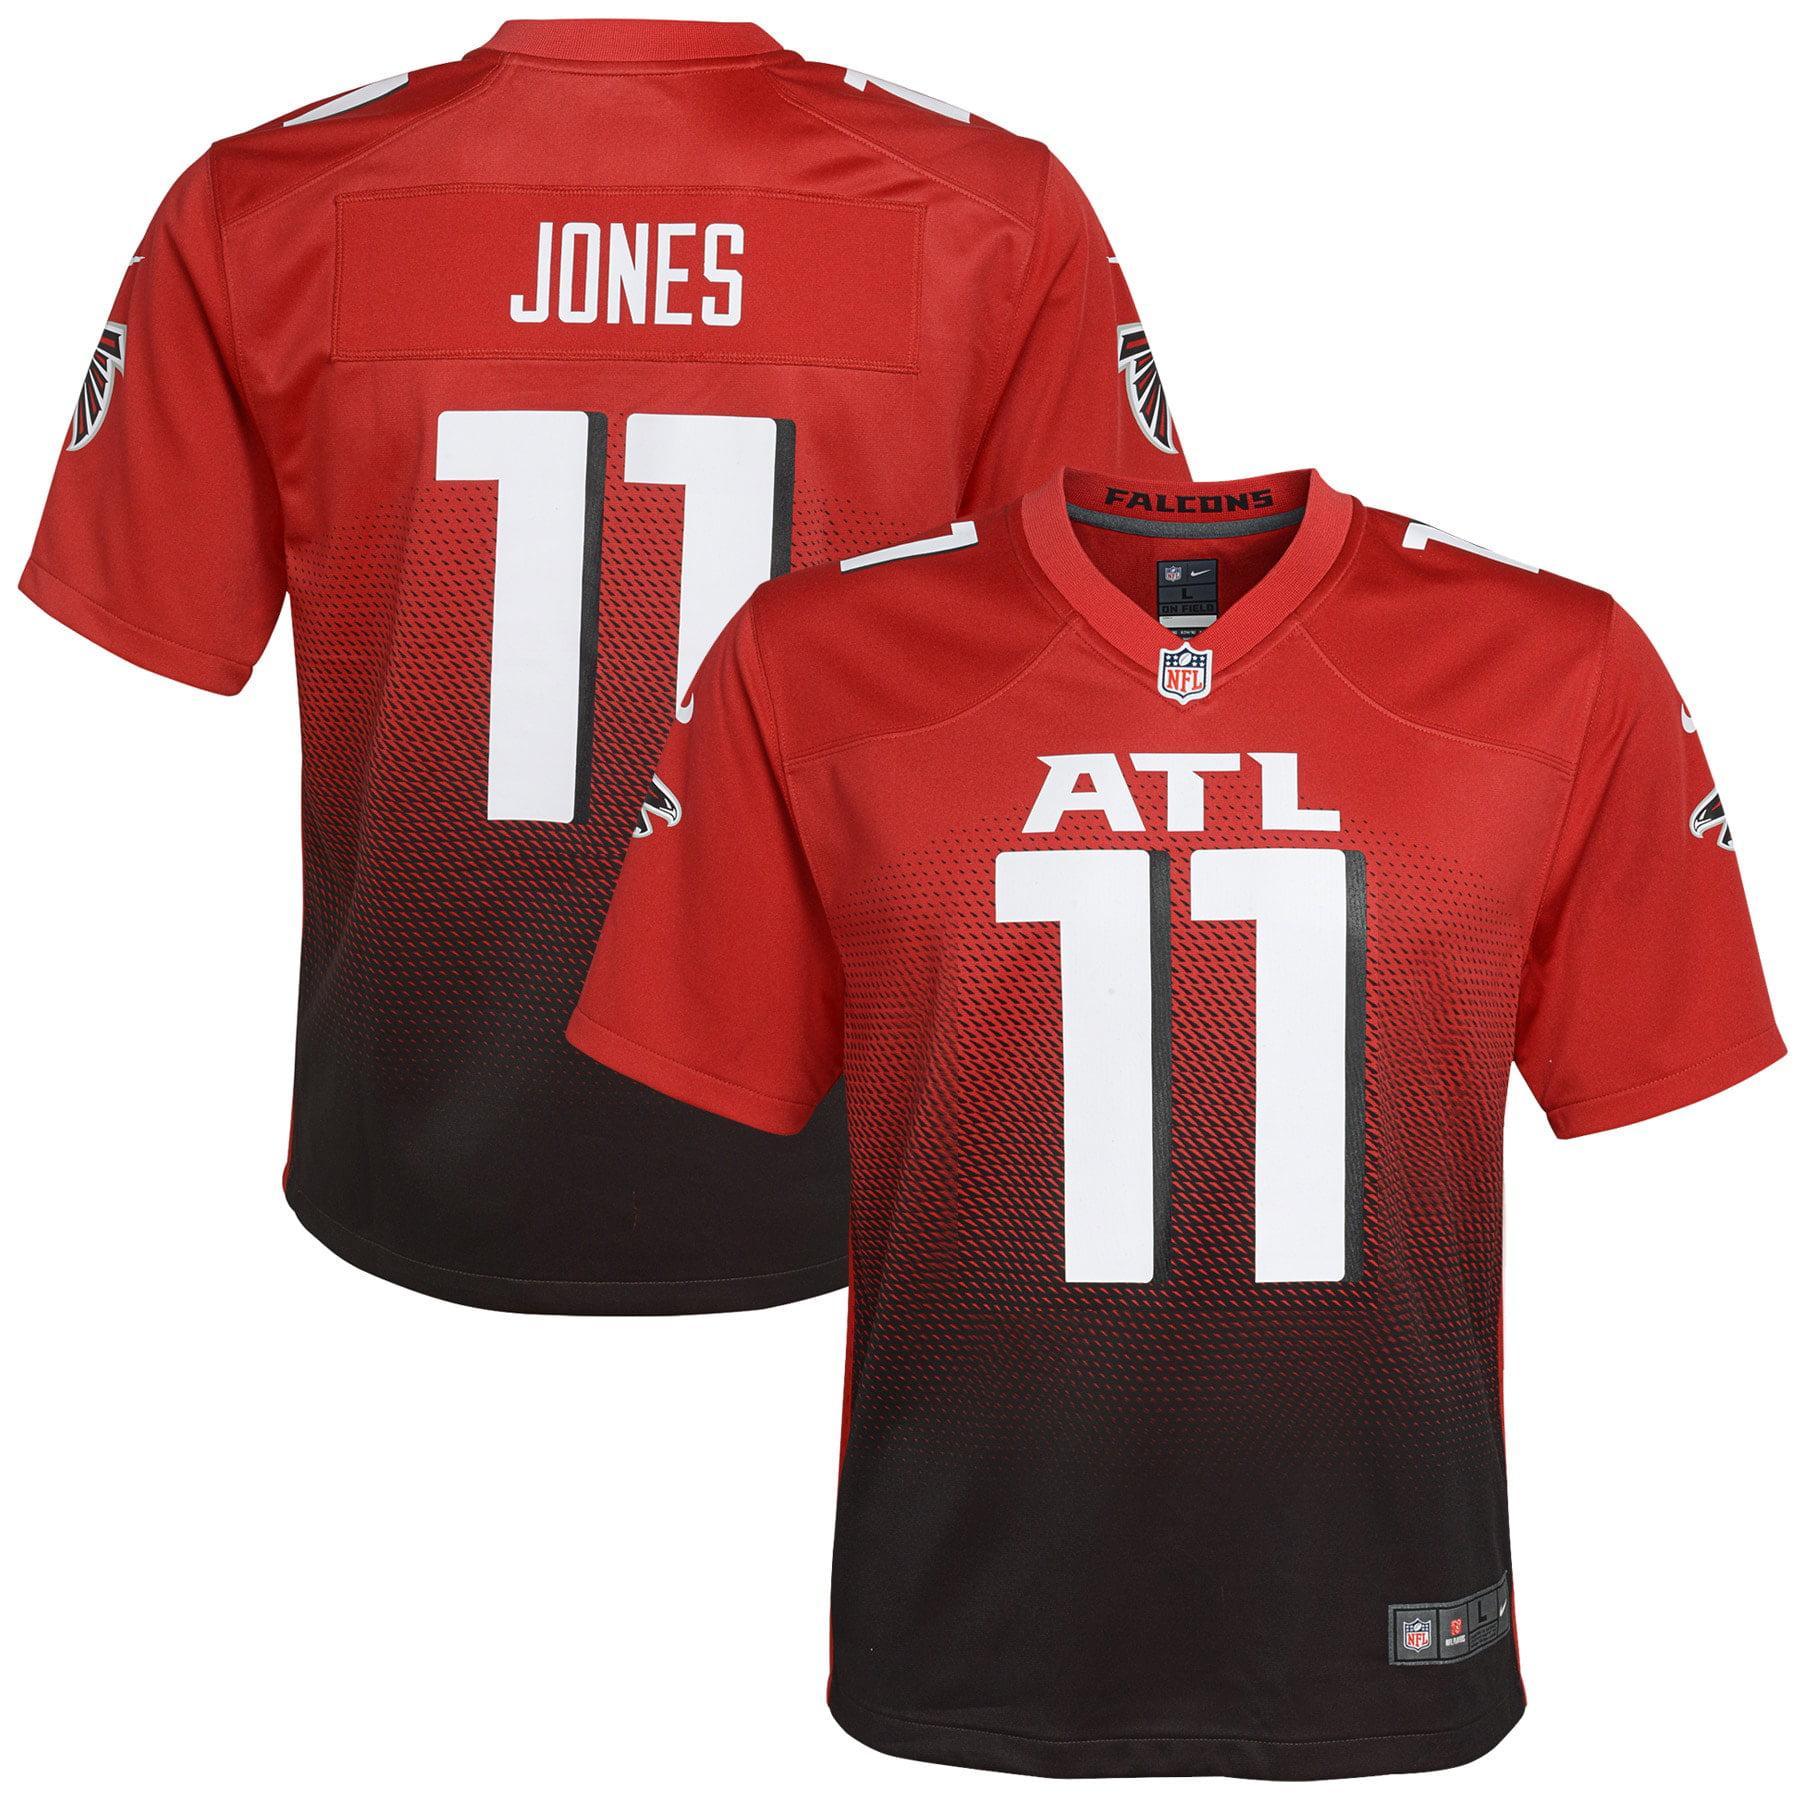 Julio Jones Atlanta Falcons Nike Youth 2nd Alternate Game Jersey - Red - Walmart.com